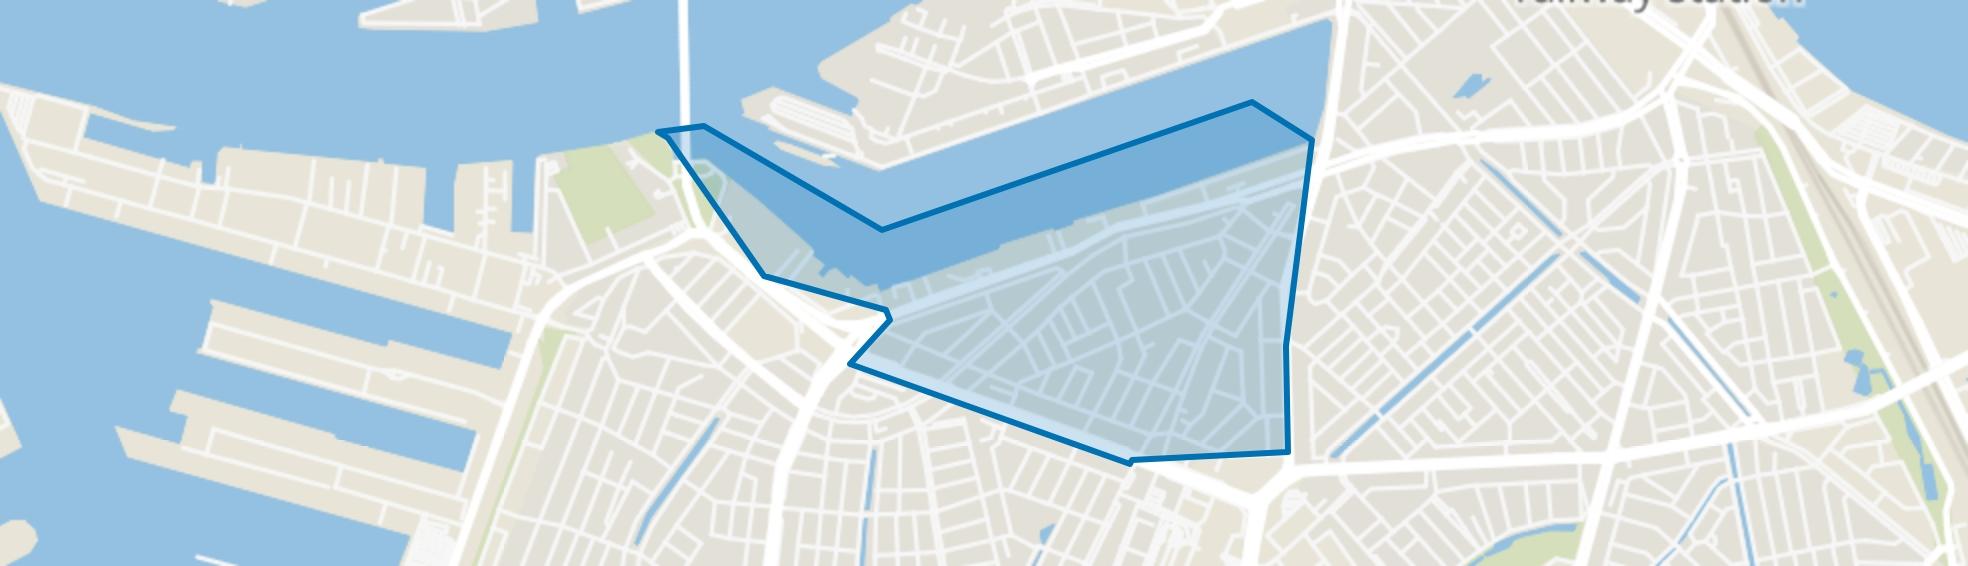 Tarwewijk, Rotterdam map